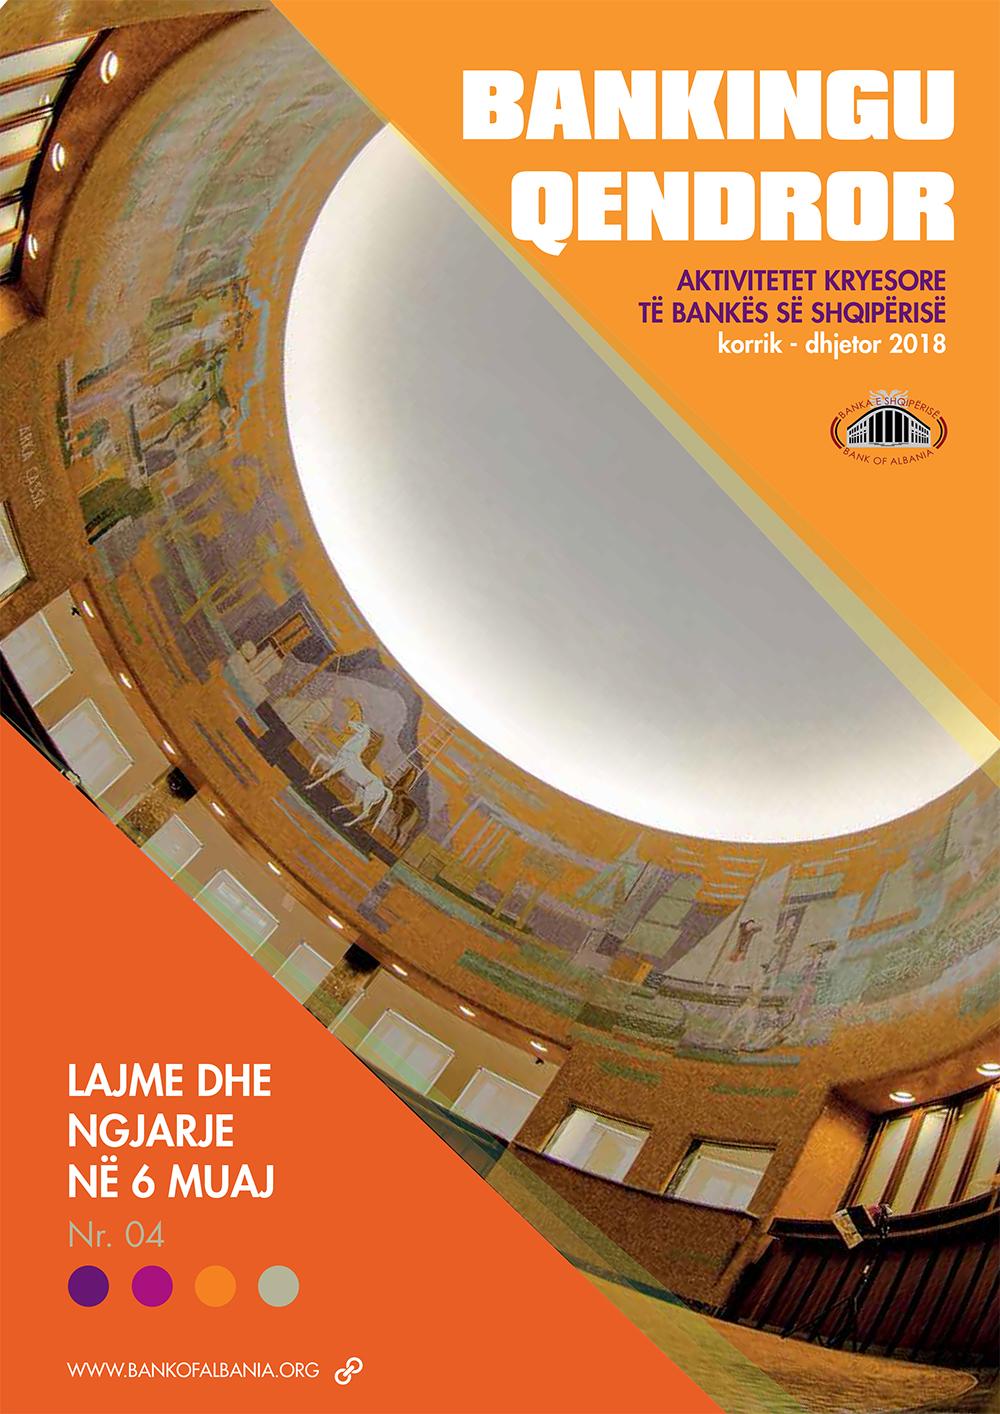 Central Banking magazine, July - December 2018